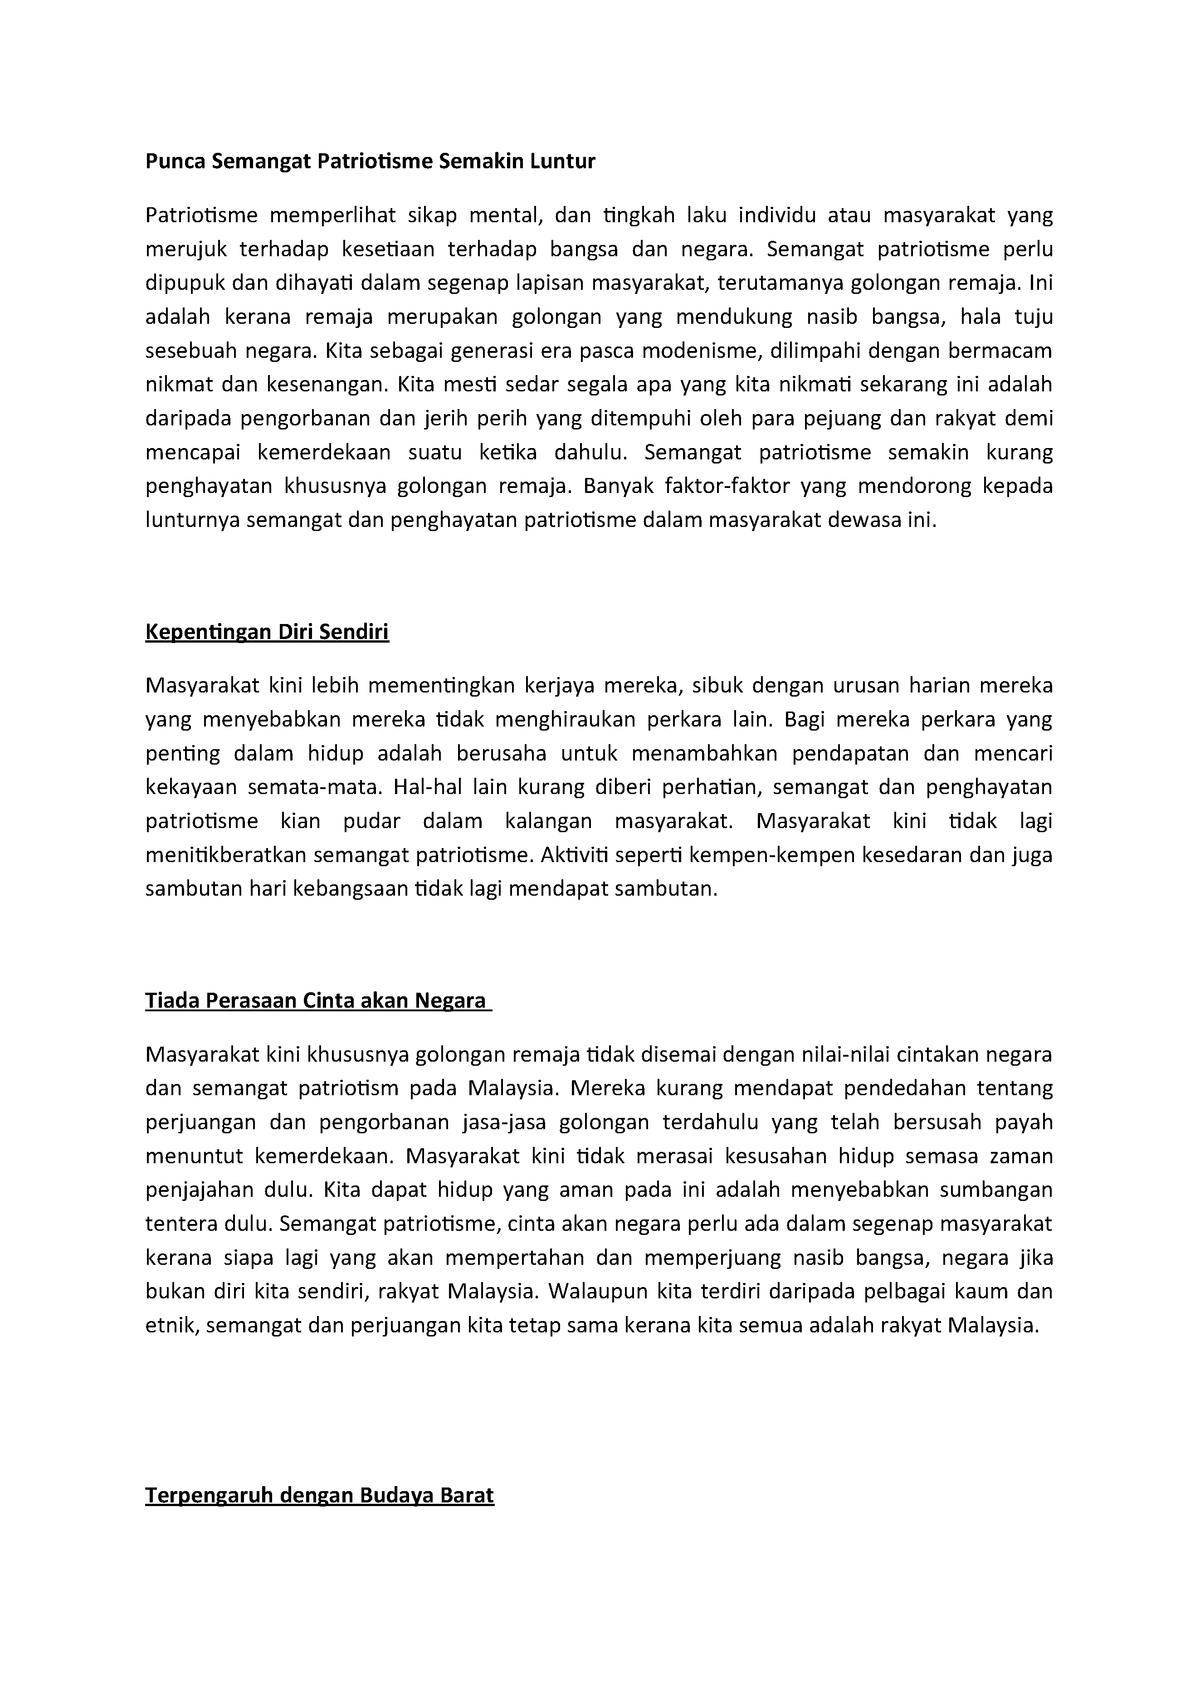 Punca Semangat Patriotisme Semakin Luntur Mgt 506 Studocu